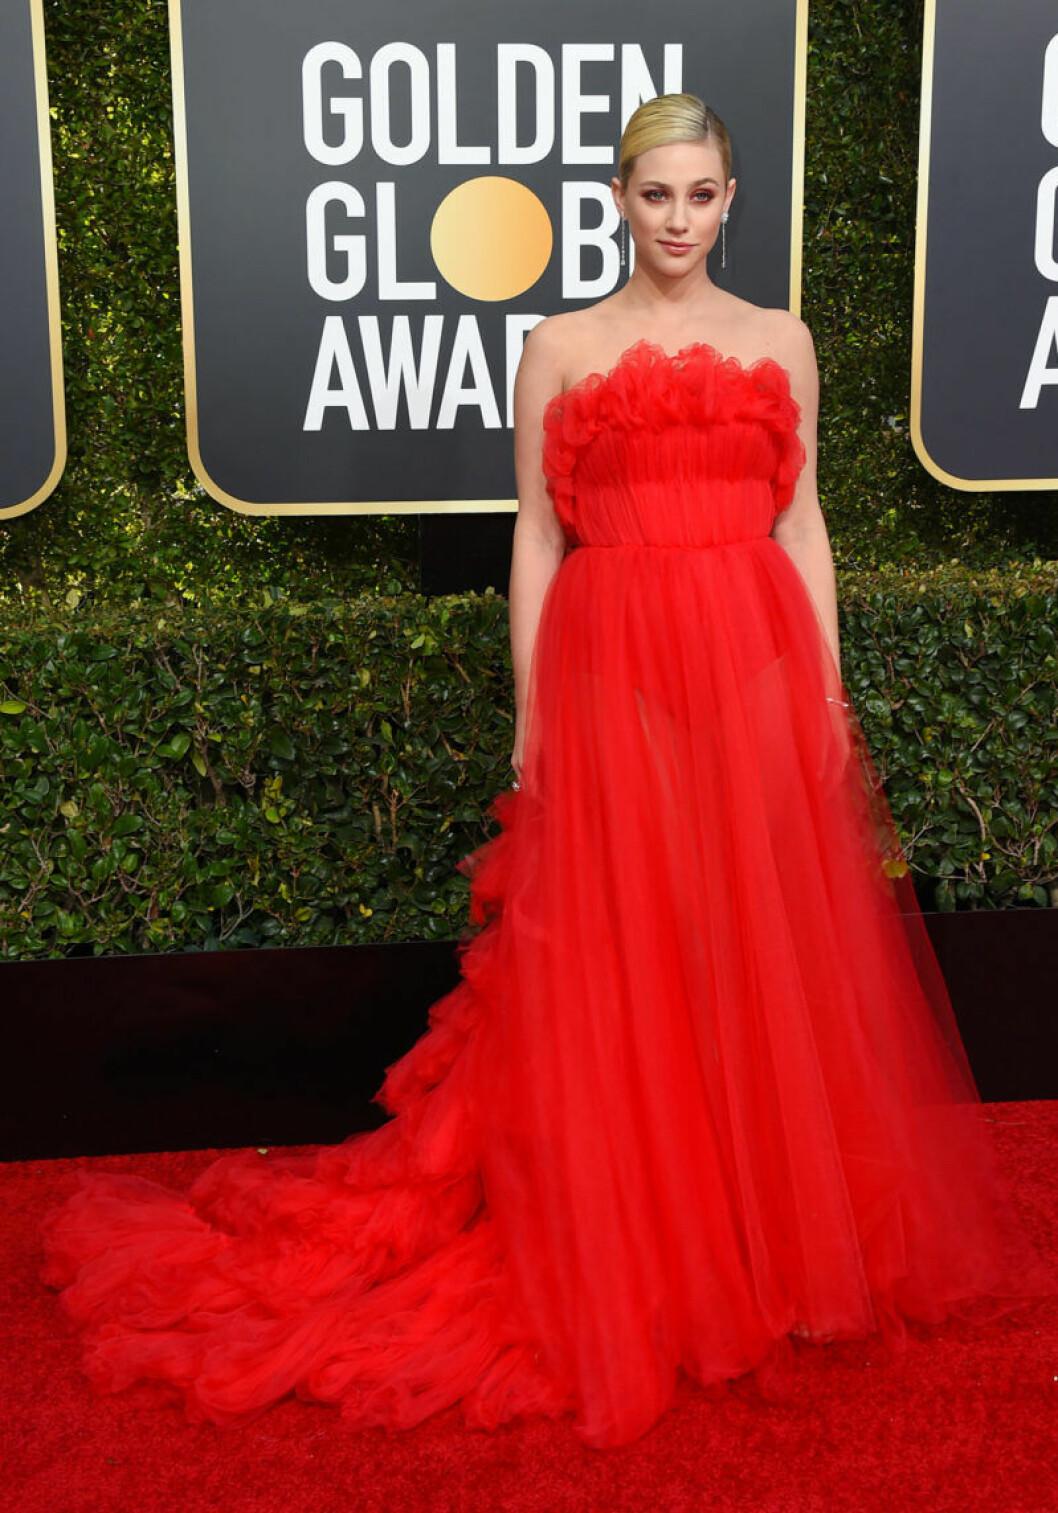 Lili Reinhart Golden Globe 2019